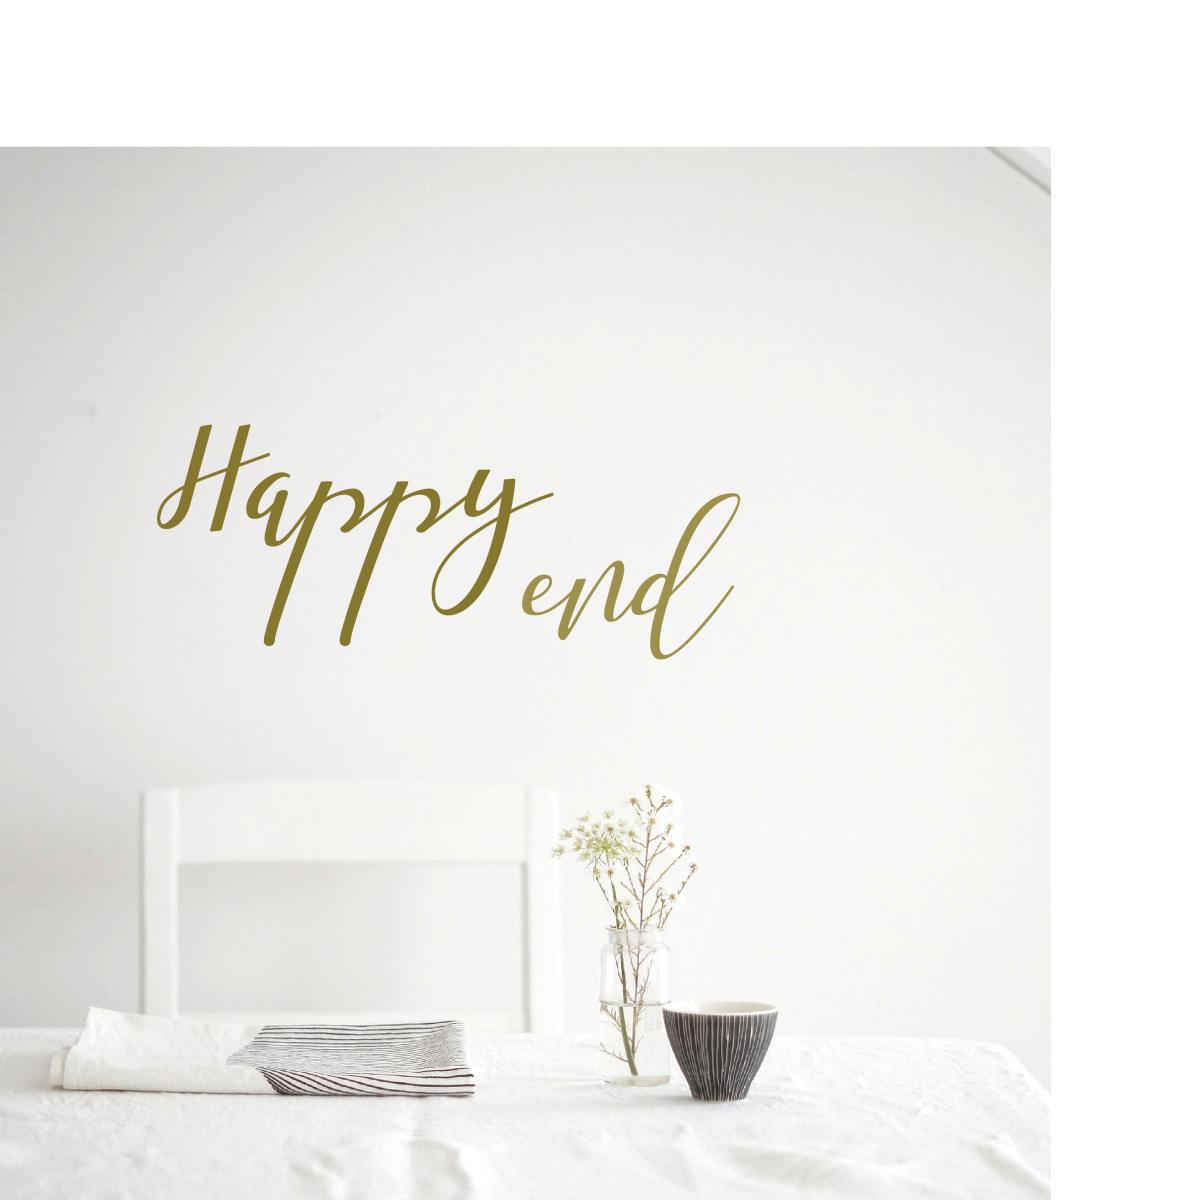 Happy end | Foto: Sabine Wittig